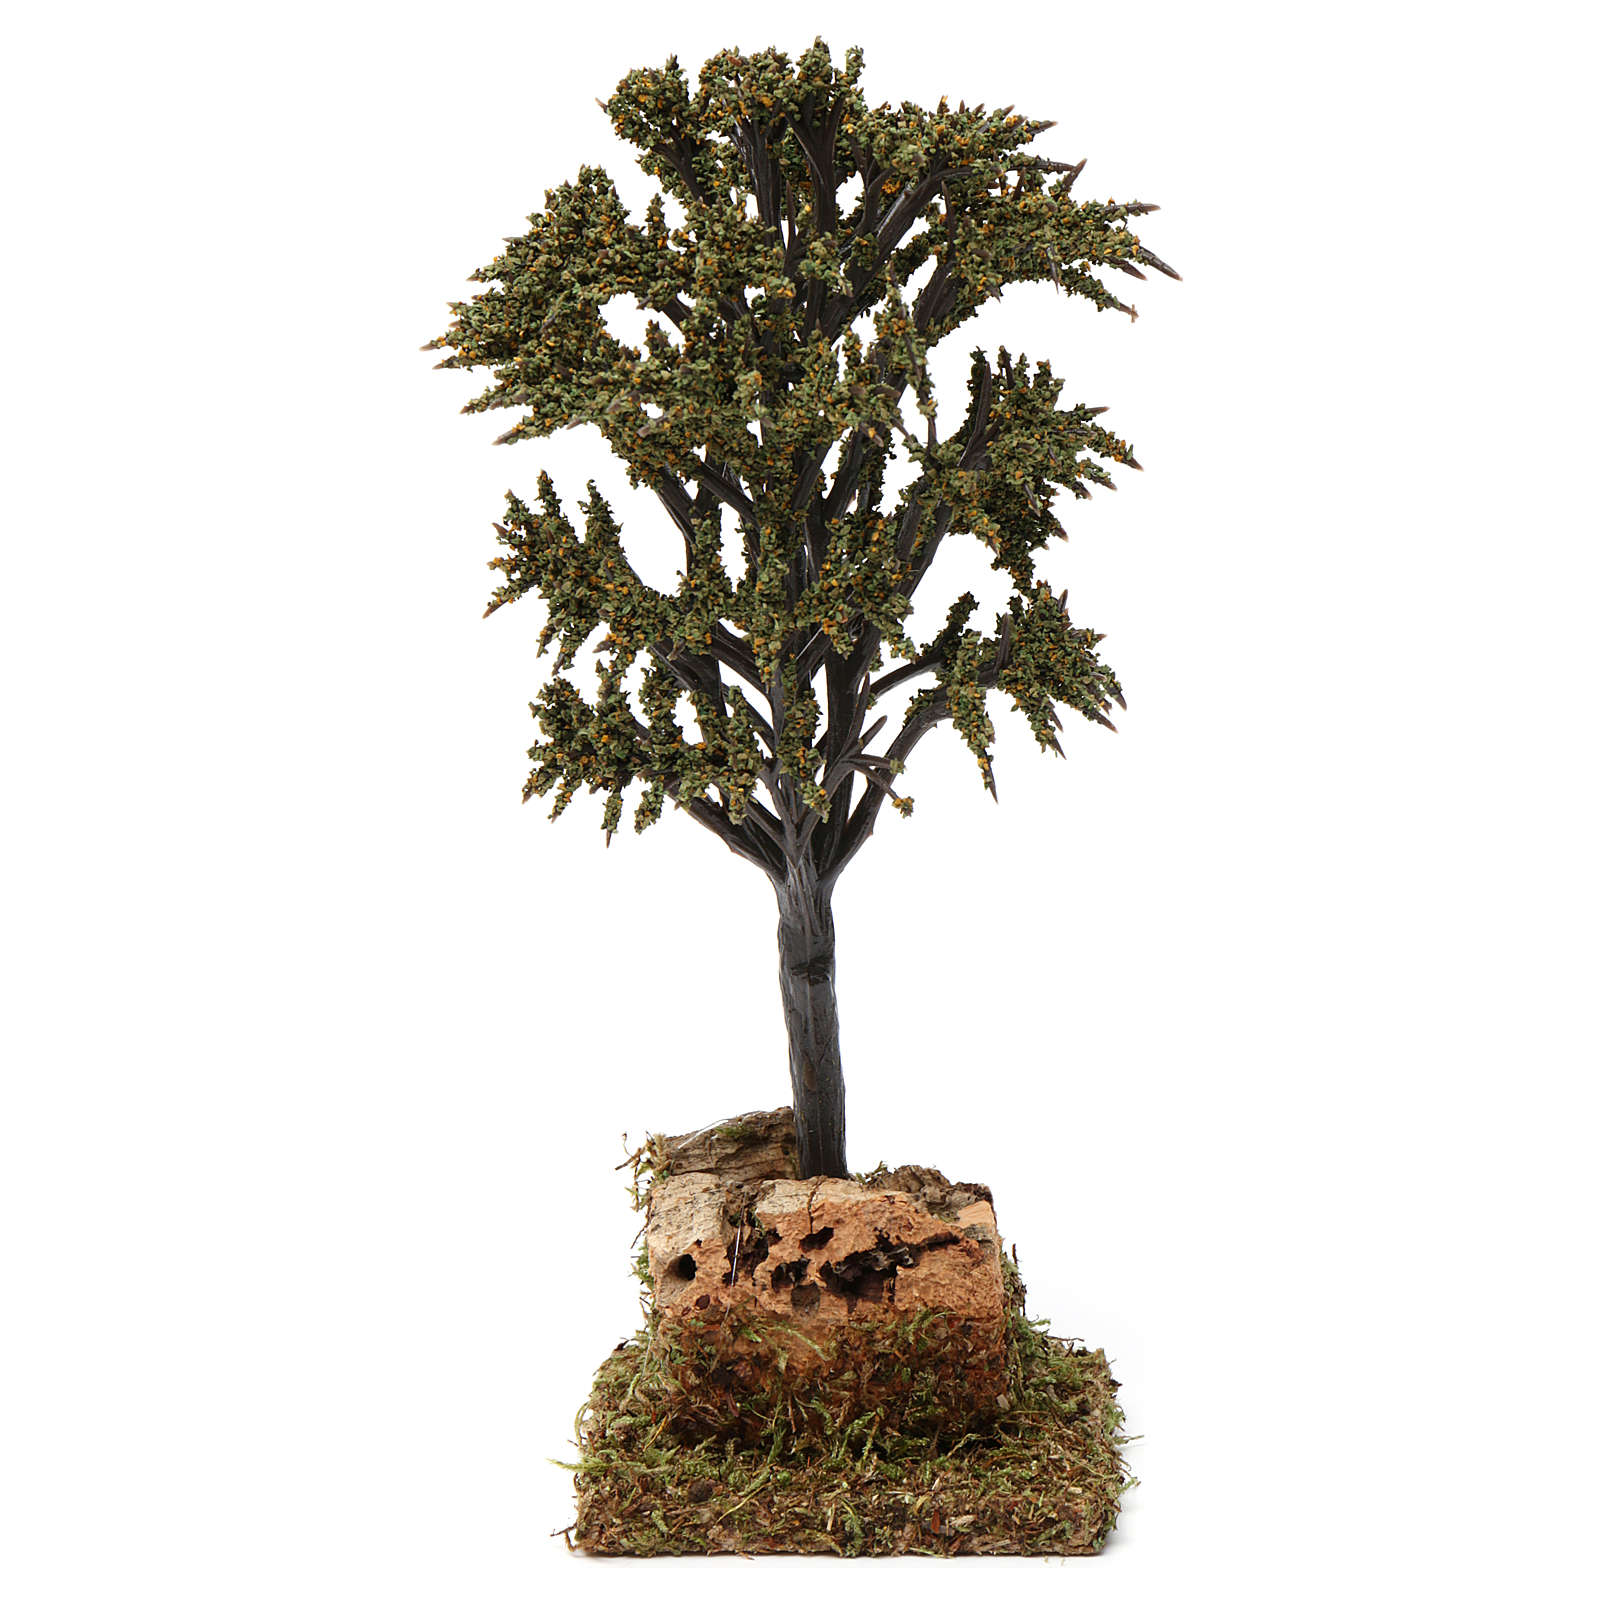 Albero verde con rami per presepe 7-10 cm 4